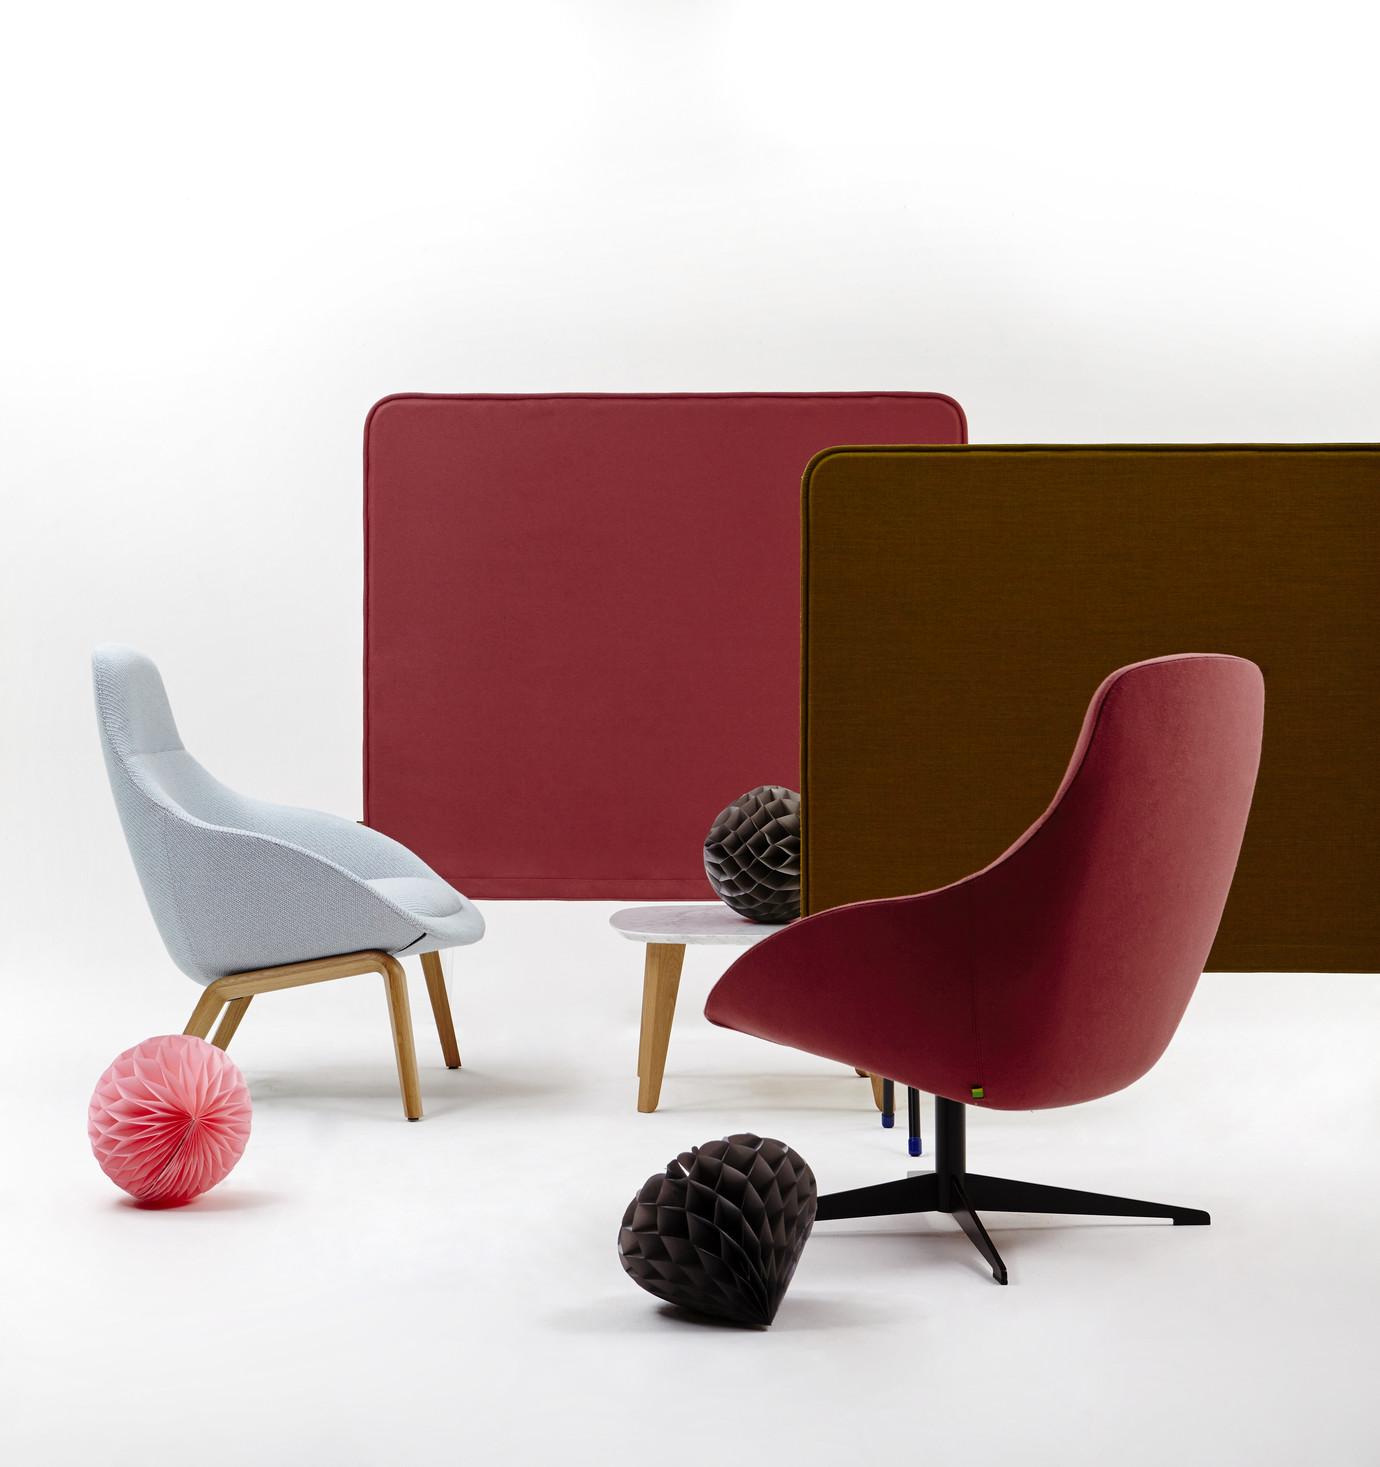 10-1-Silla-Lounge-Always-Comodidad-1380